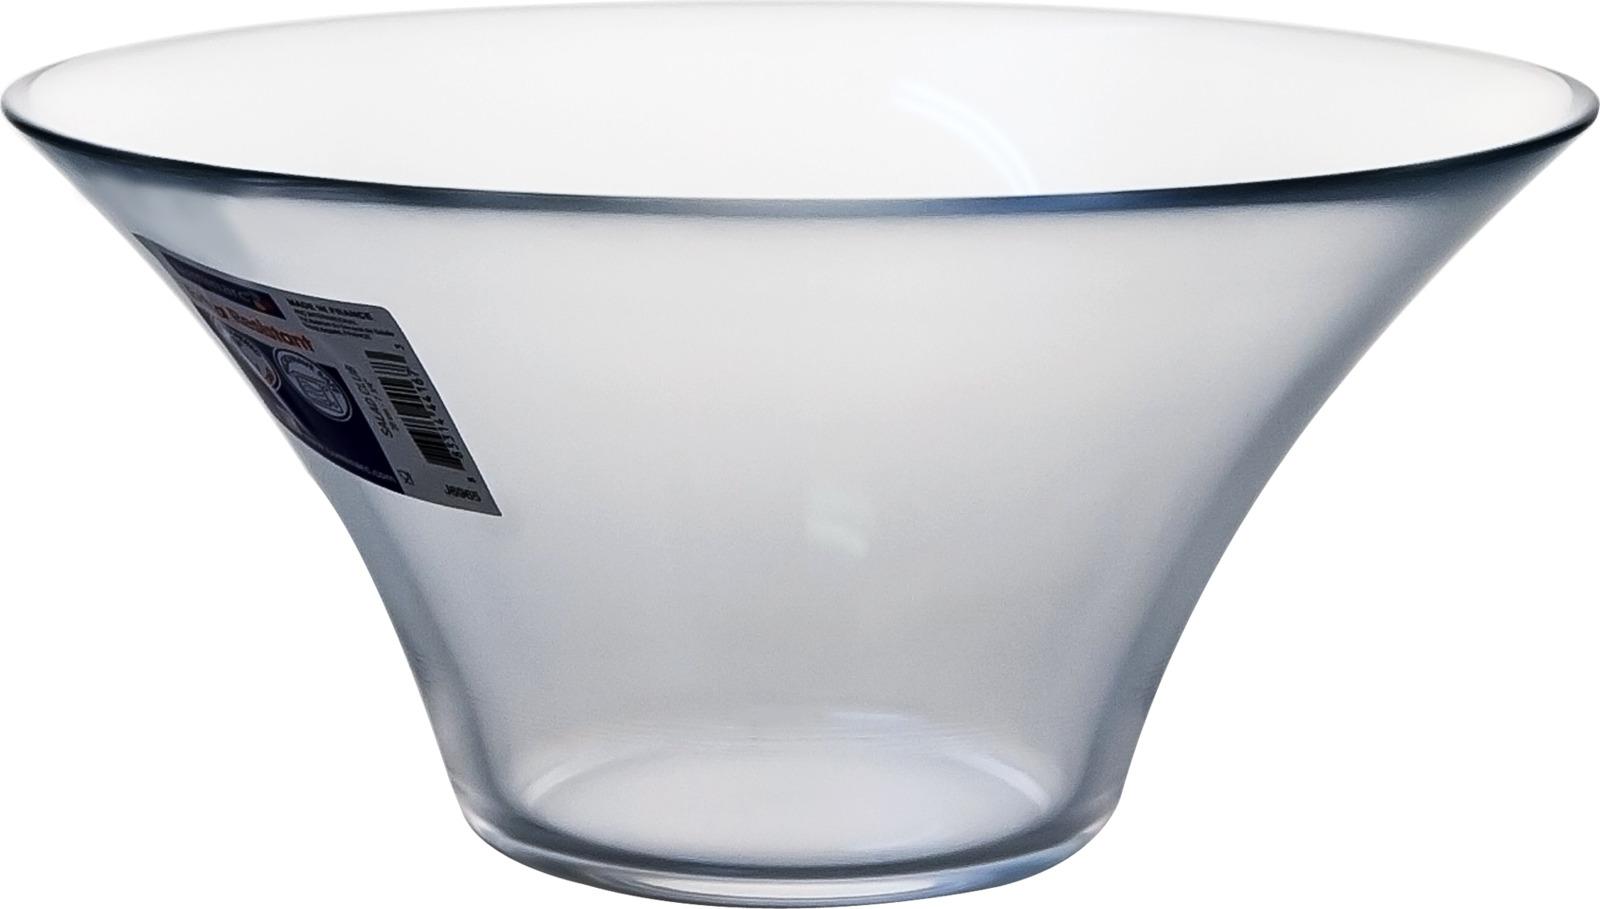 Салатник Luminarc Salad Club, L4611, диаметр 28 см салатник luminarc космос 12см 0 6л стекло